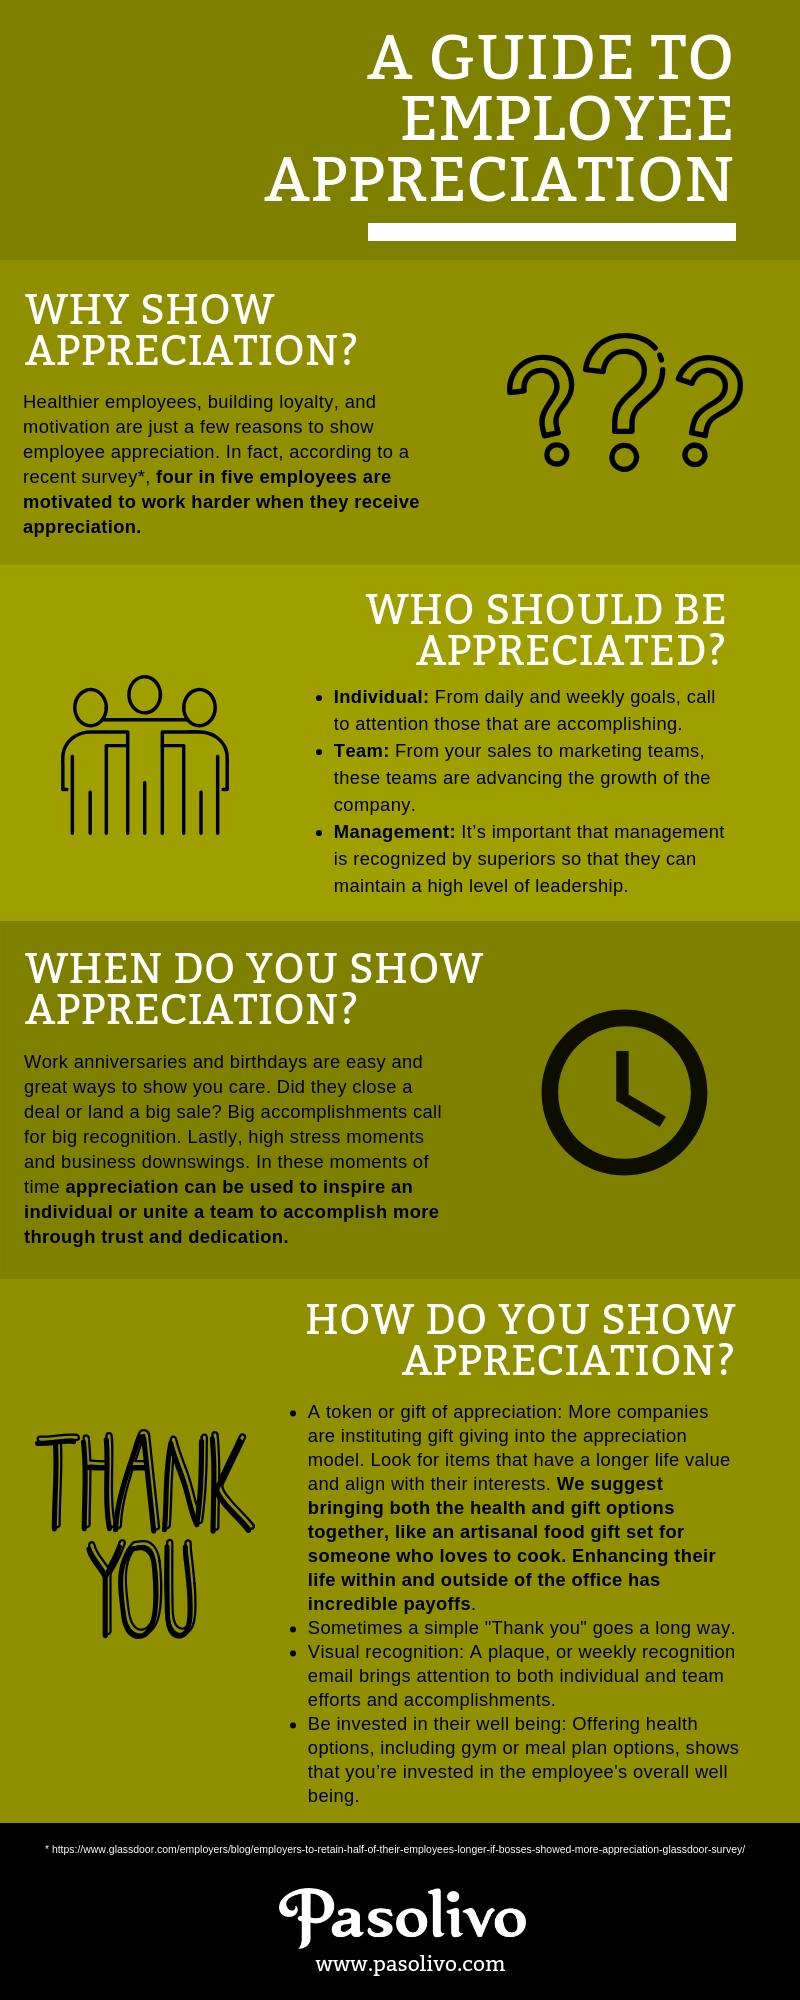 A guide to employee appreciation.final